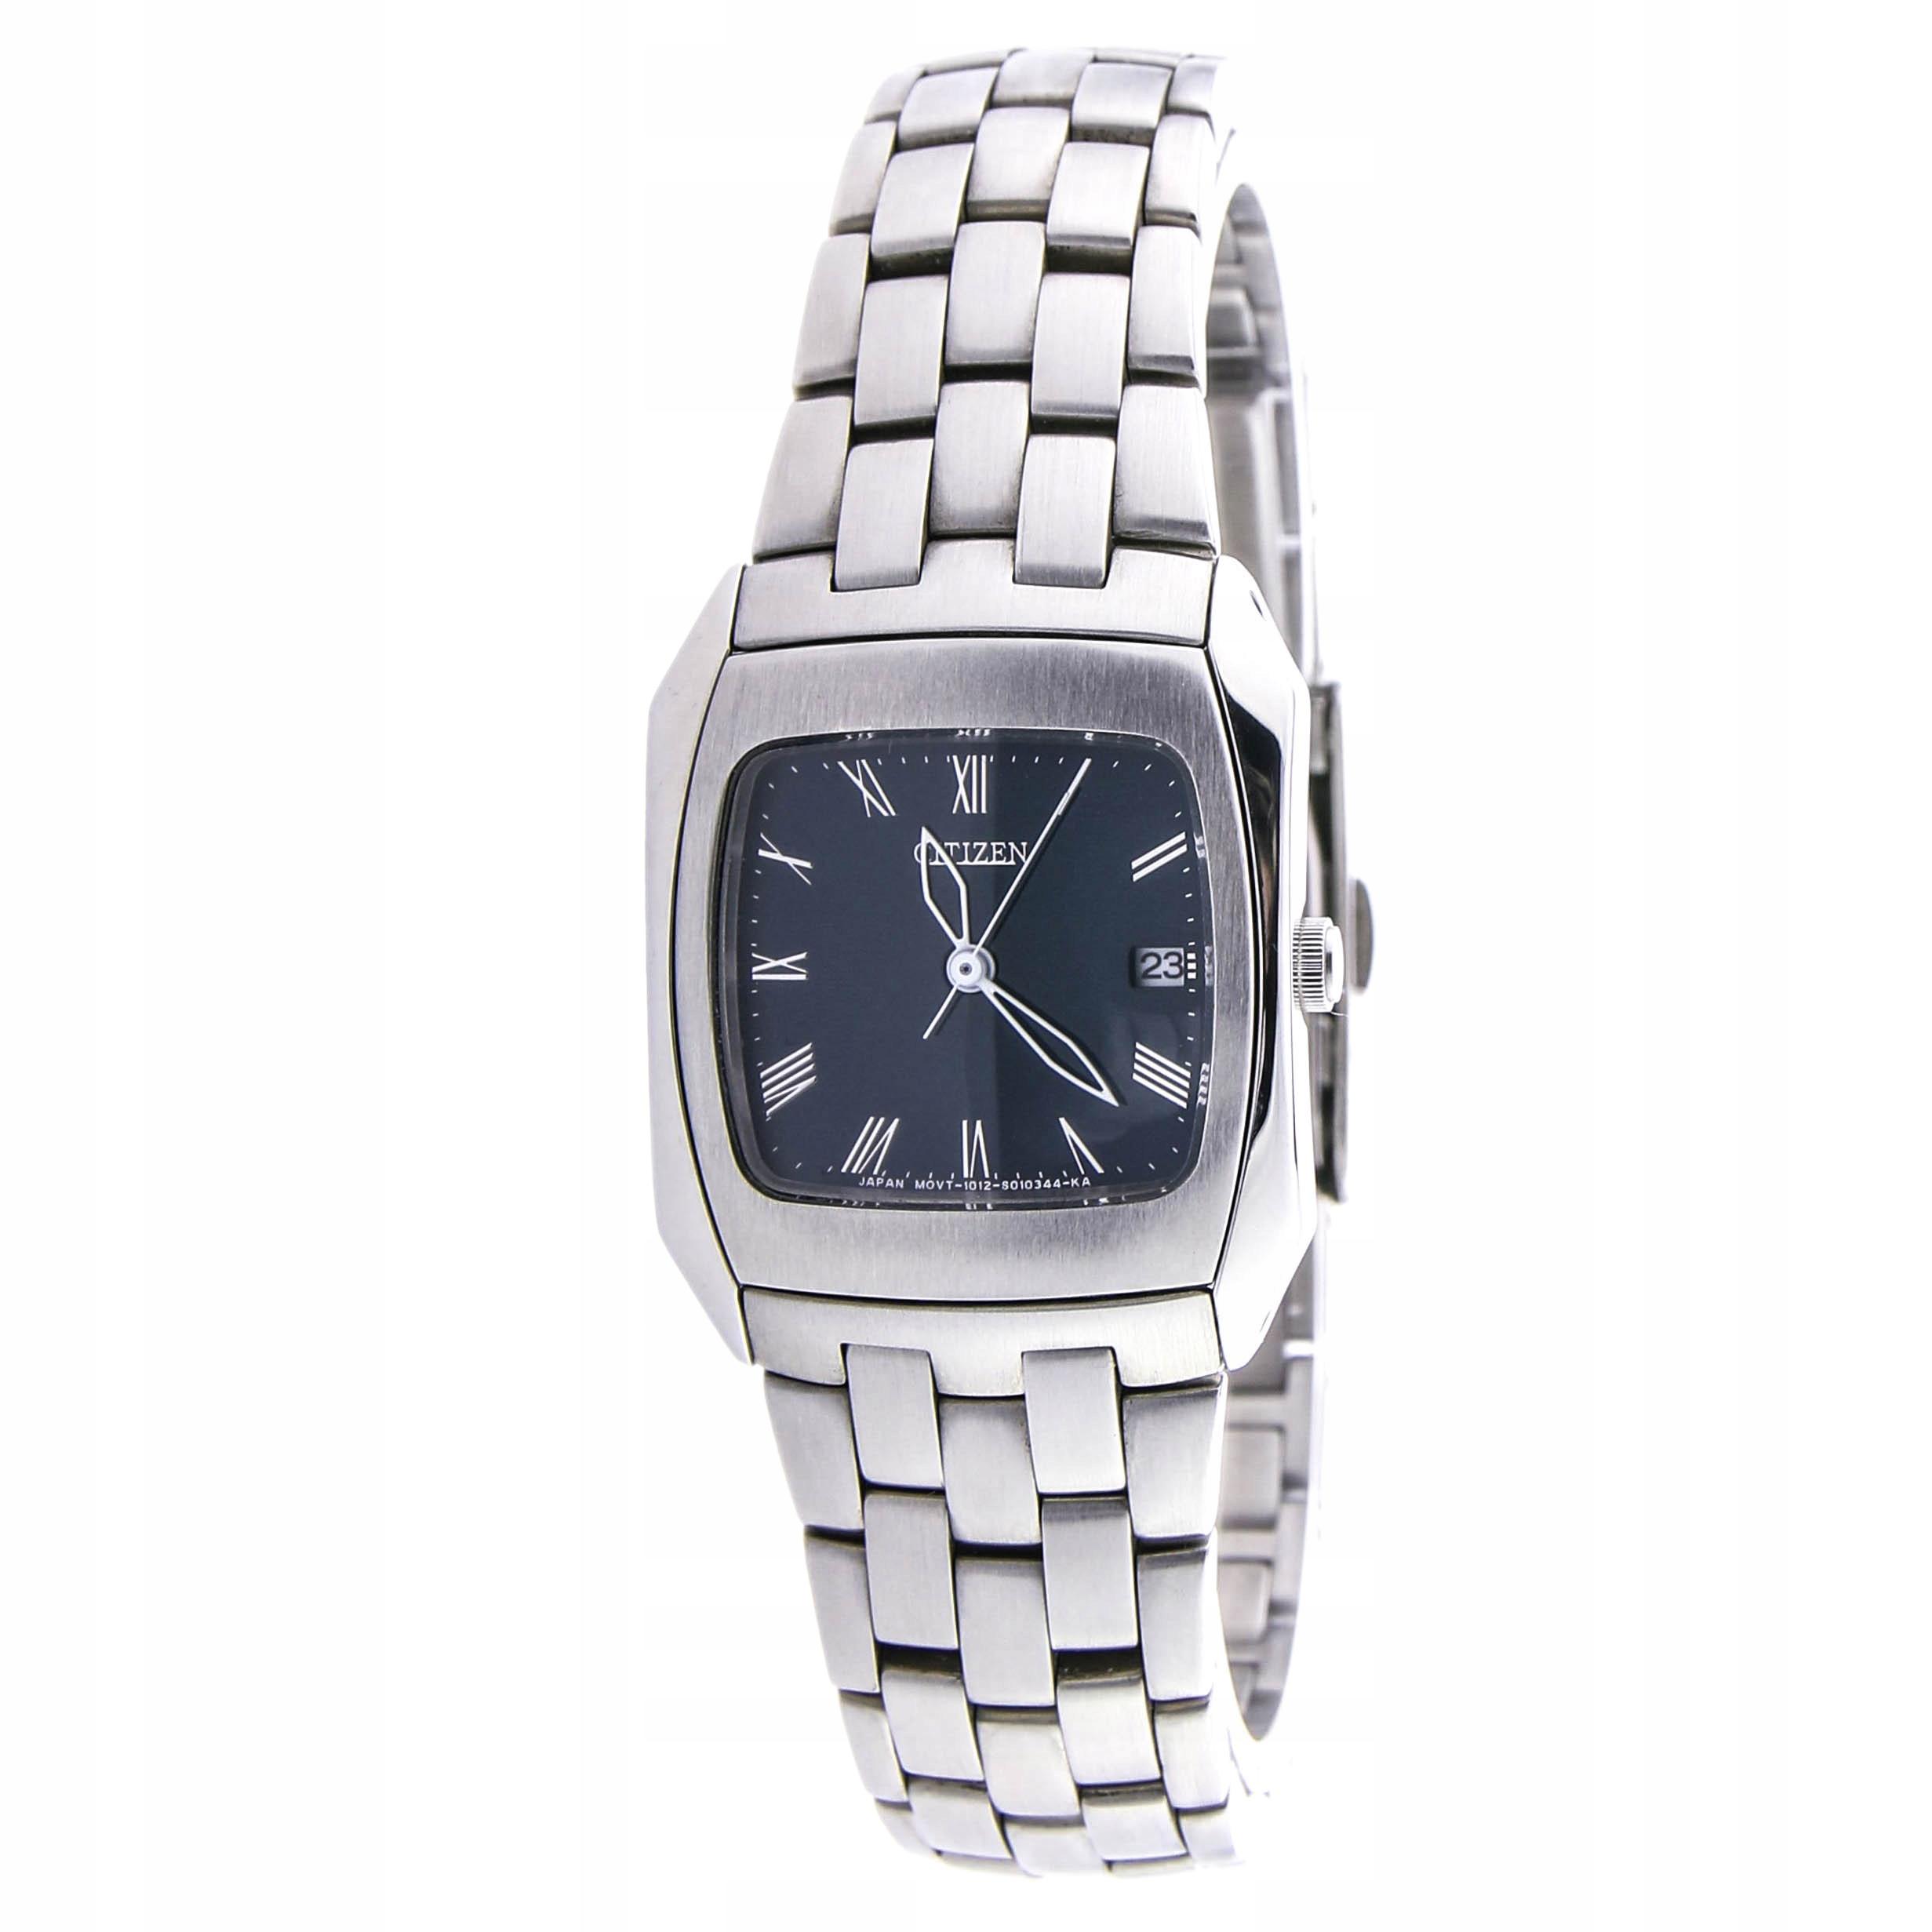 Zegarek CITIZEN G1012-S005744 datownik